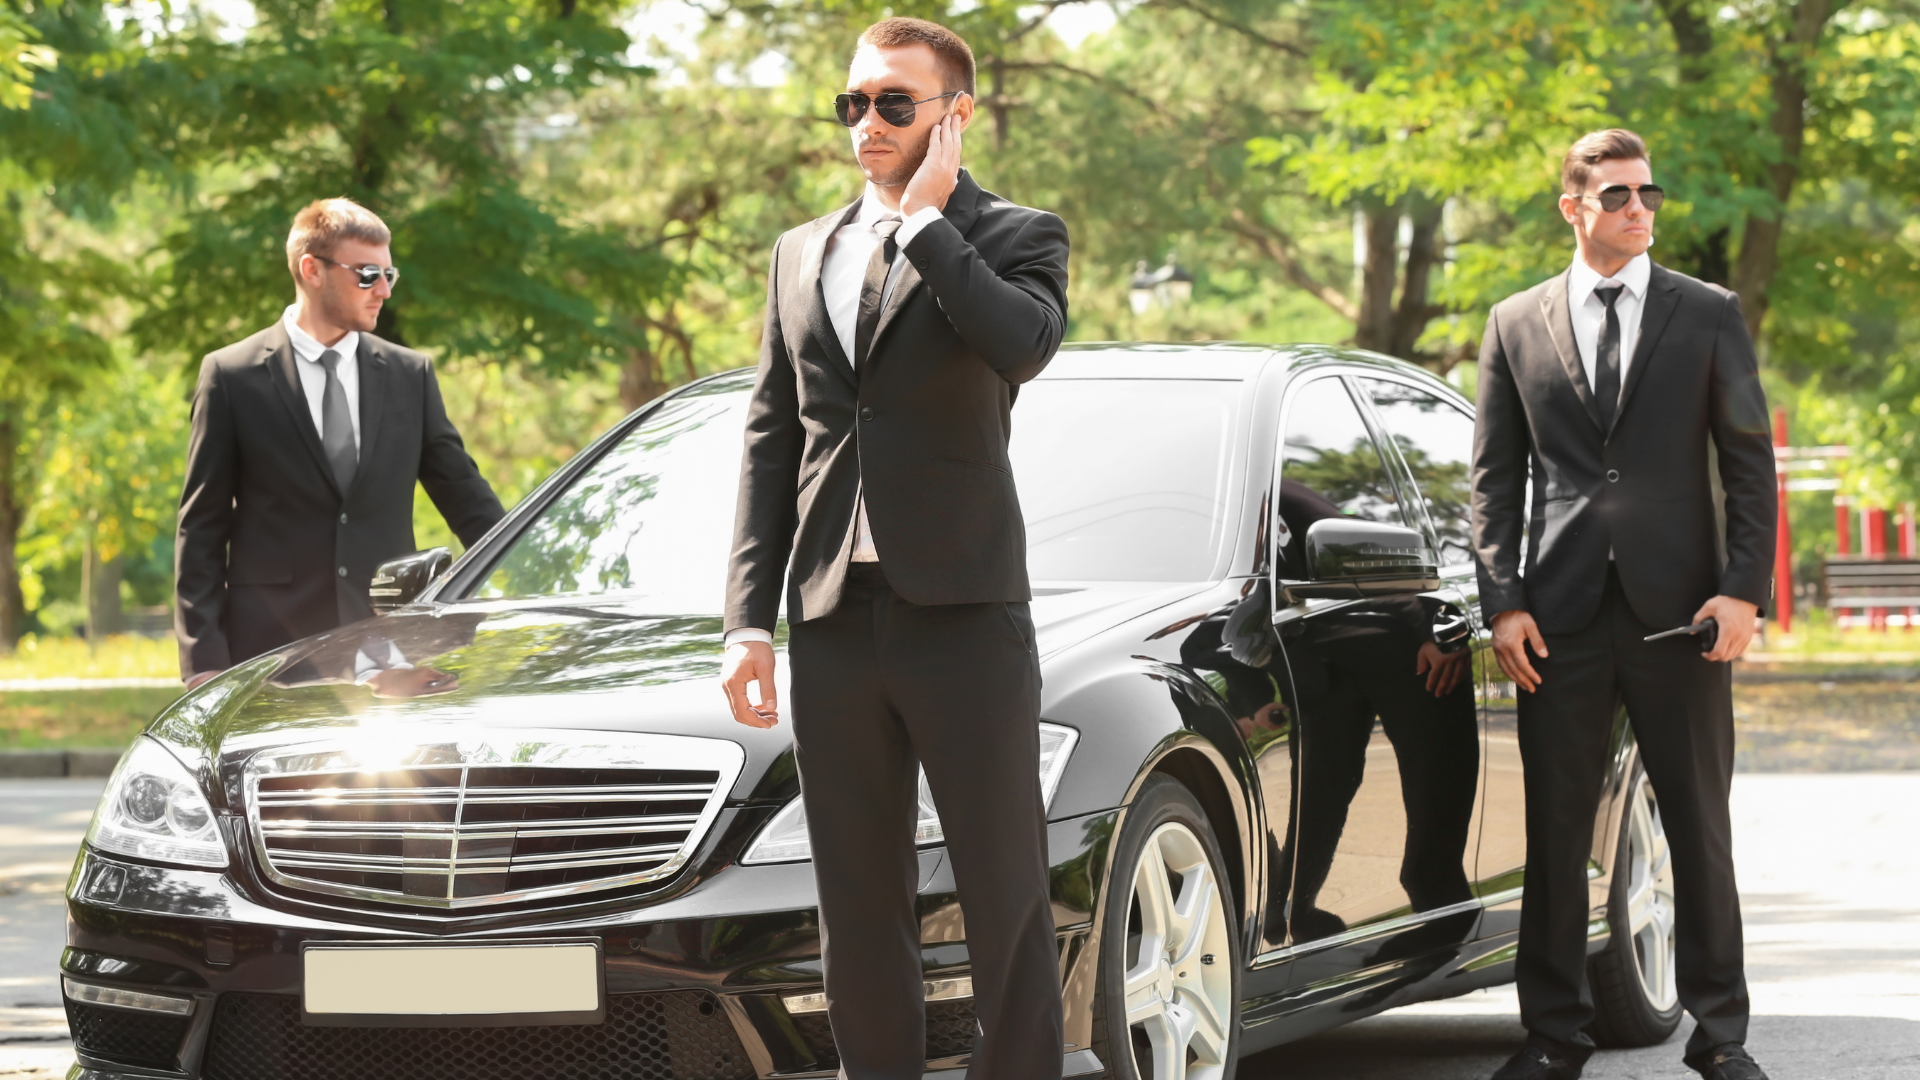 Private security (Bodyguard)